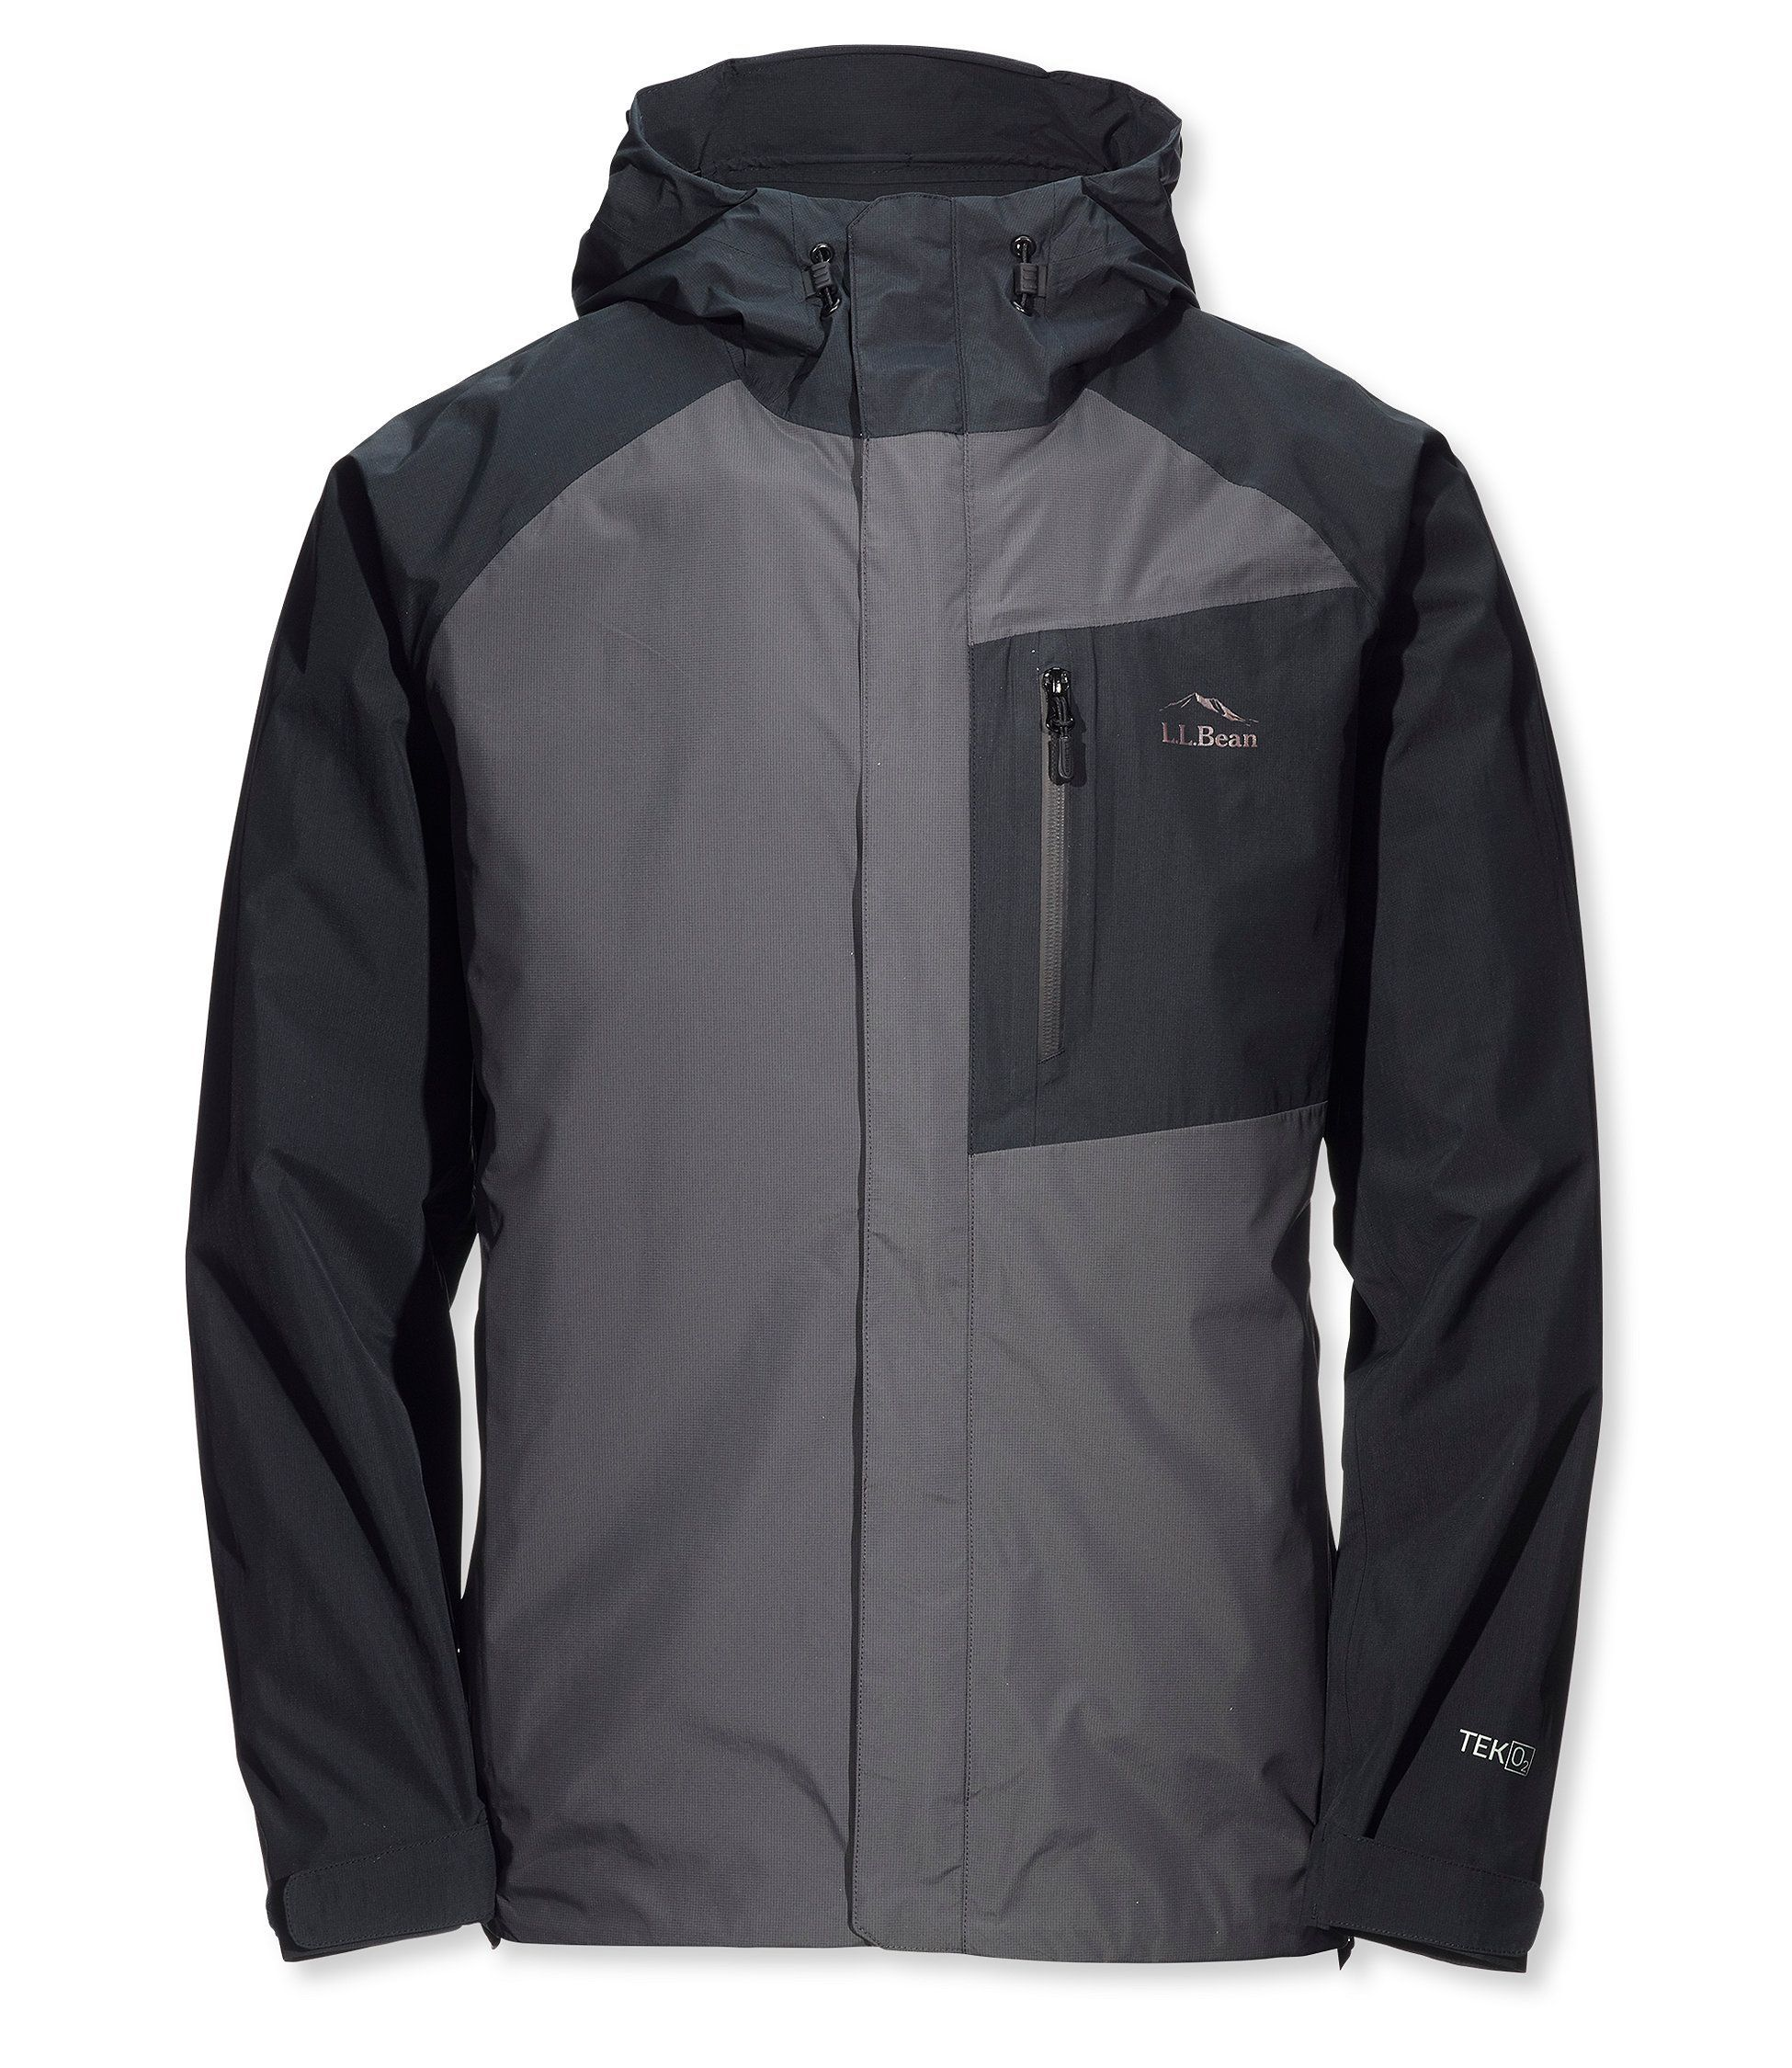 O2 Rainwear Mens Element Series Hooded Jacket